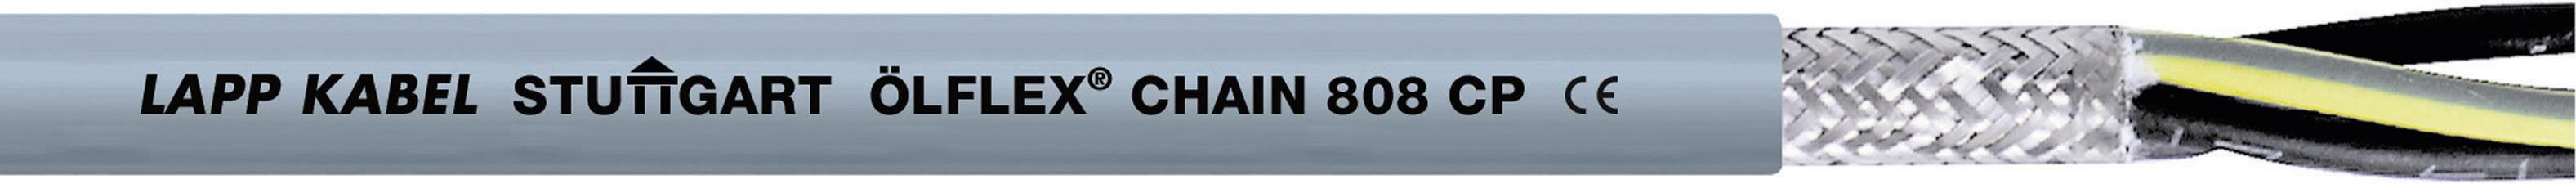 Žíla kabelu LappKabel ÖLFLEX CHAIN 808 CP 5G1,0 (1027770), 5x 1 mm², polyurethan, Ø 8,3 mm, stíněný, 100 m, še